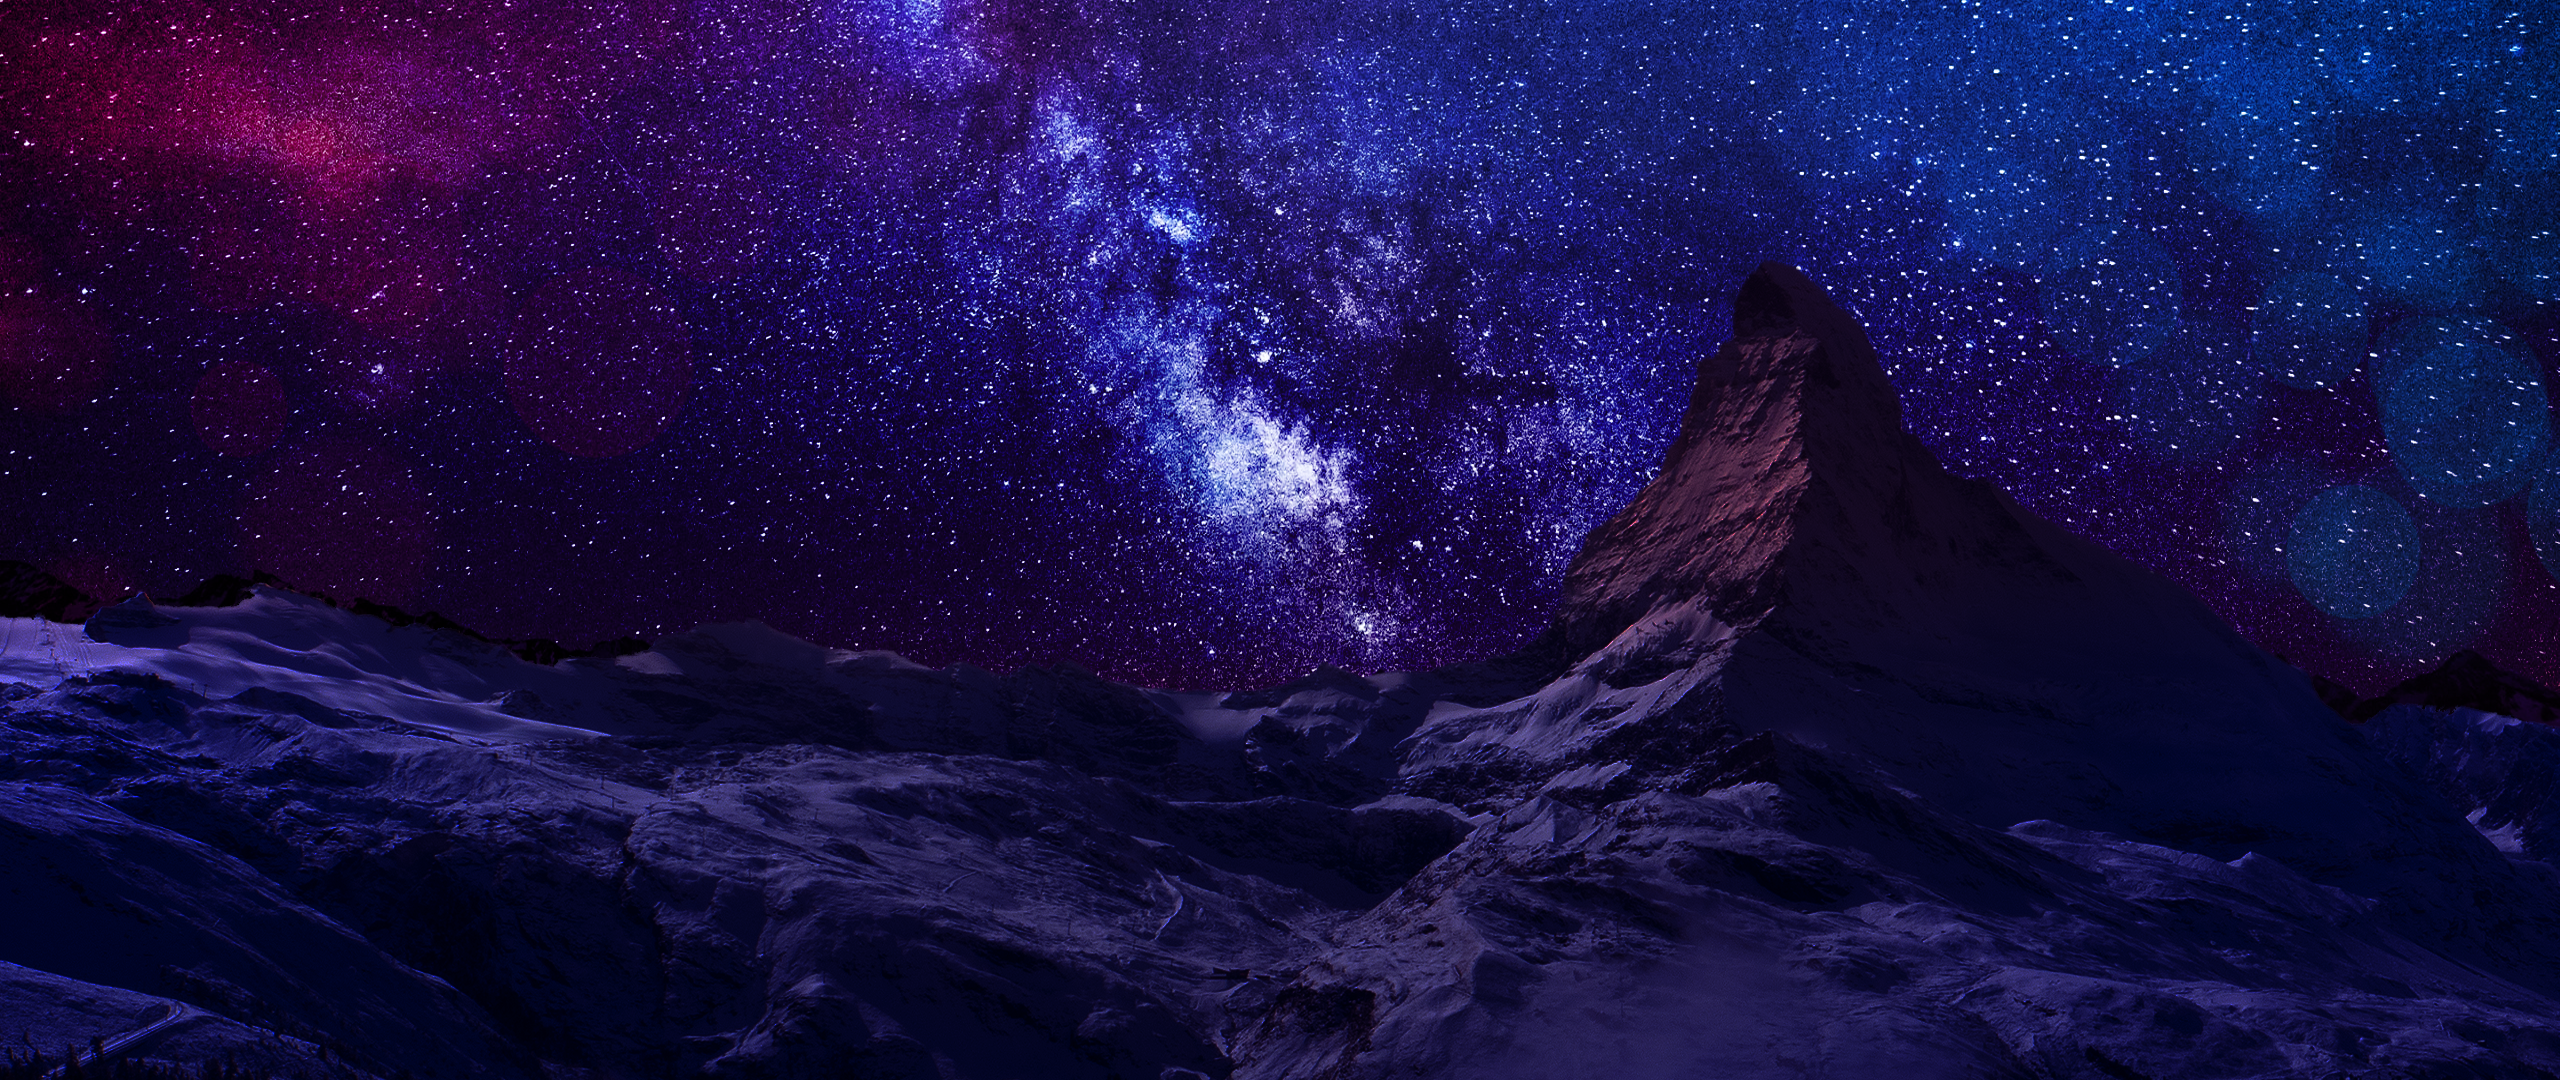 Night Computer Wallpapers Desktop Backgrounds 2560x1080 ID561492 2560x1080